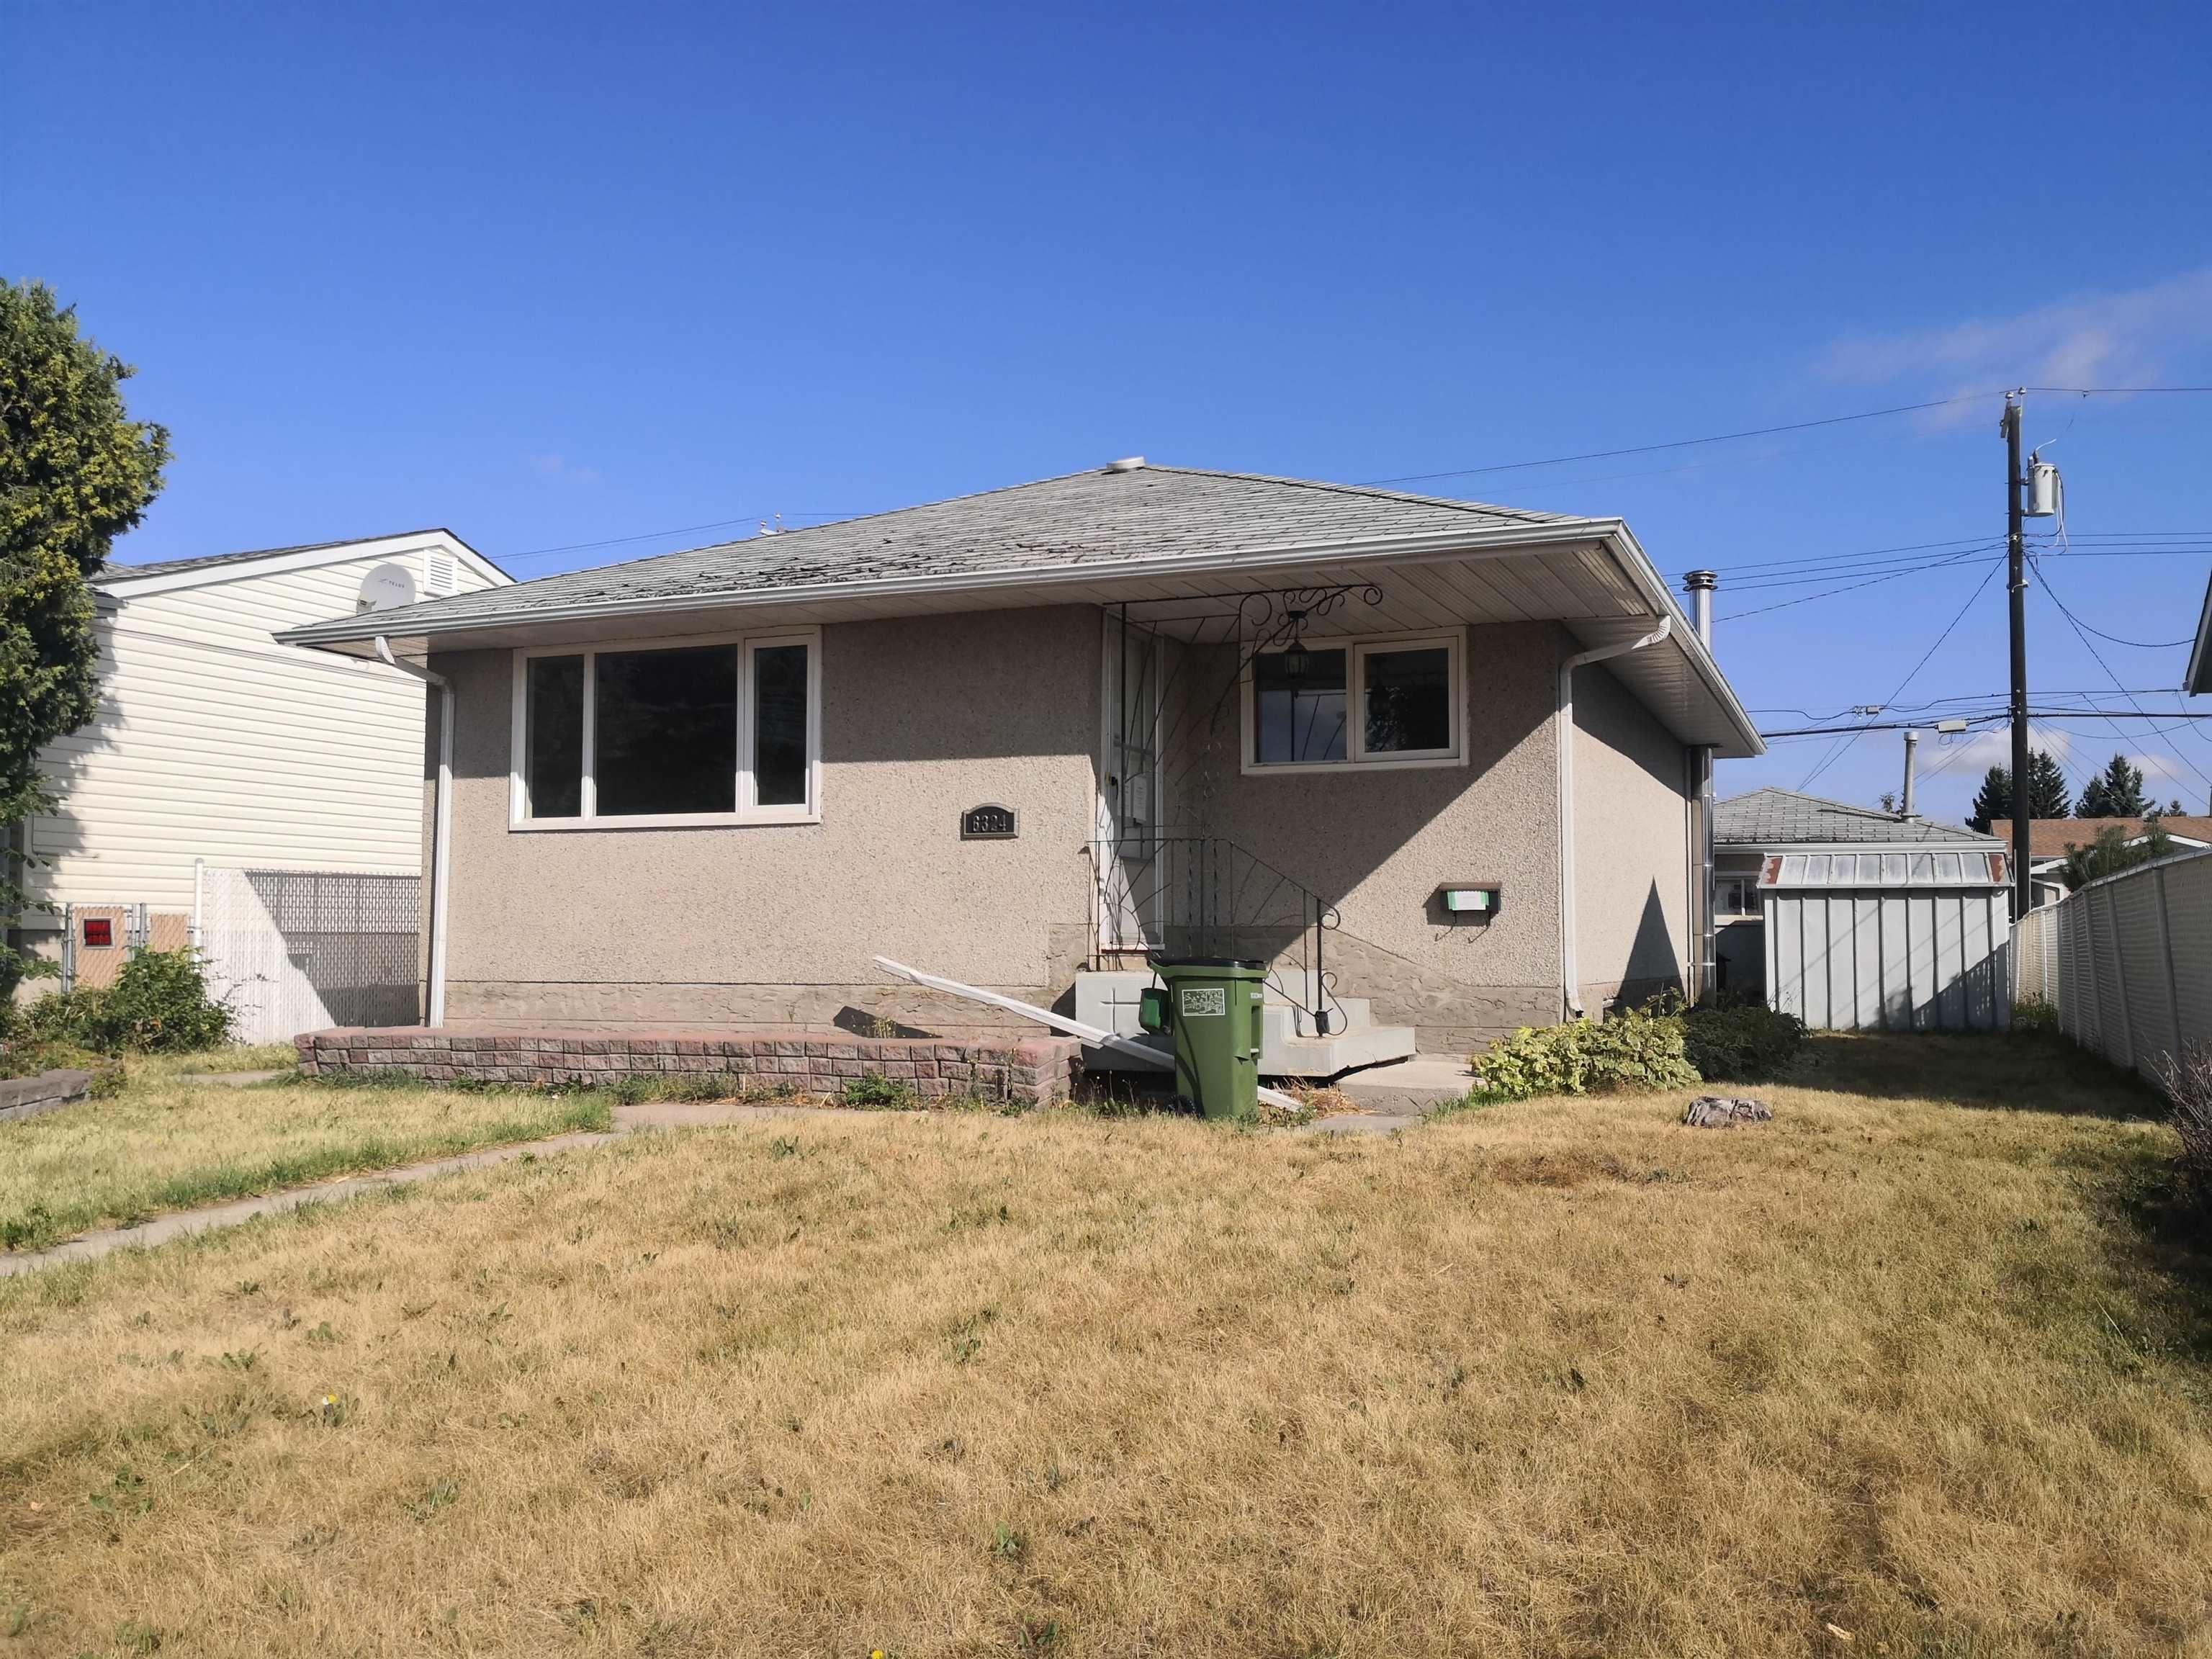 Main Photo: 6324 132 Avenue in Edmonton: Zone 02 House for sale : MLS®# E4261377